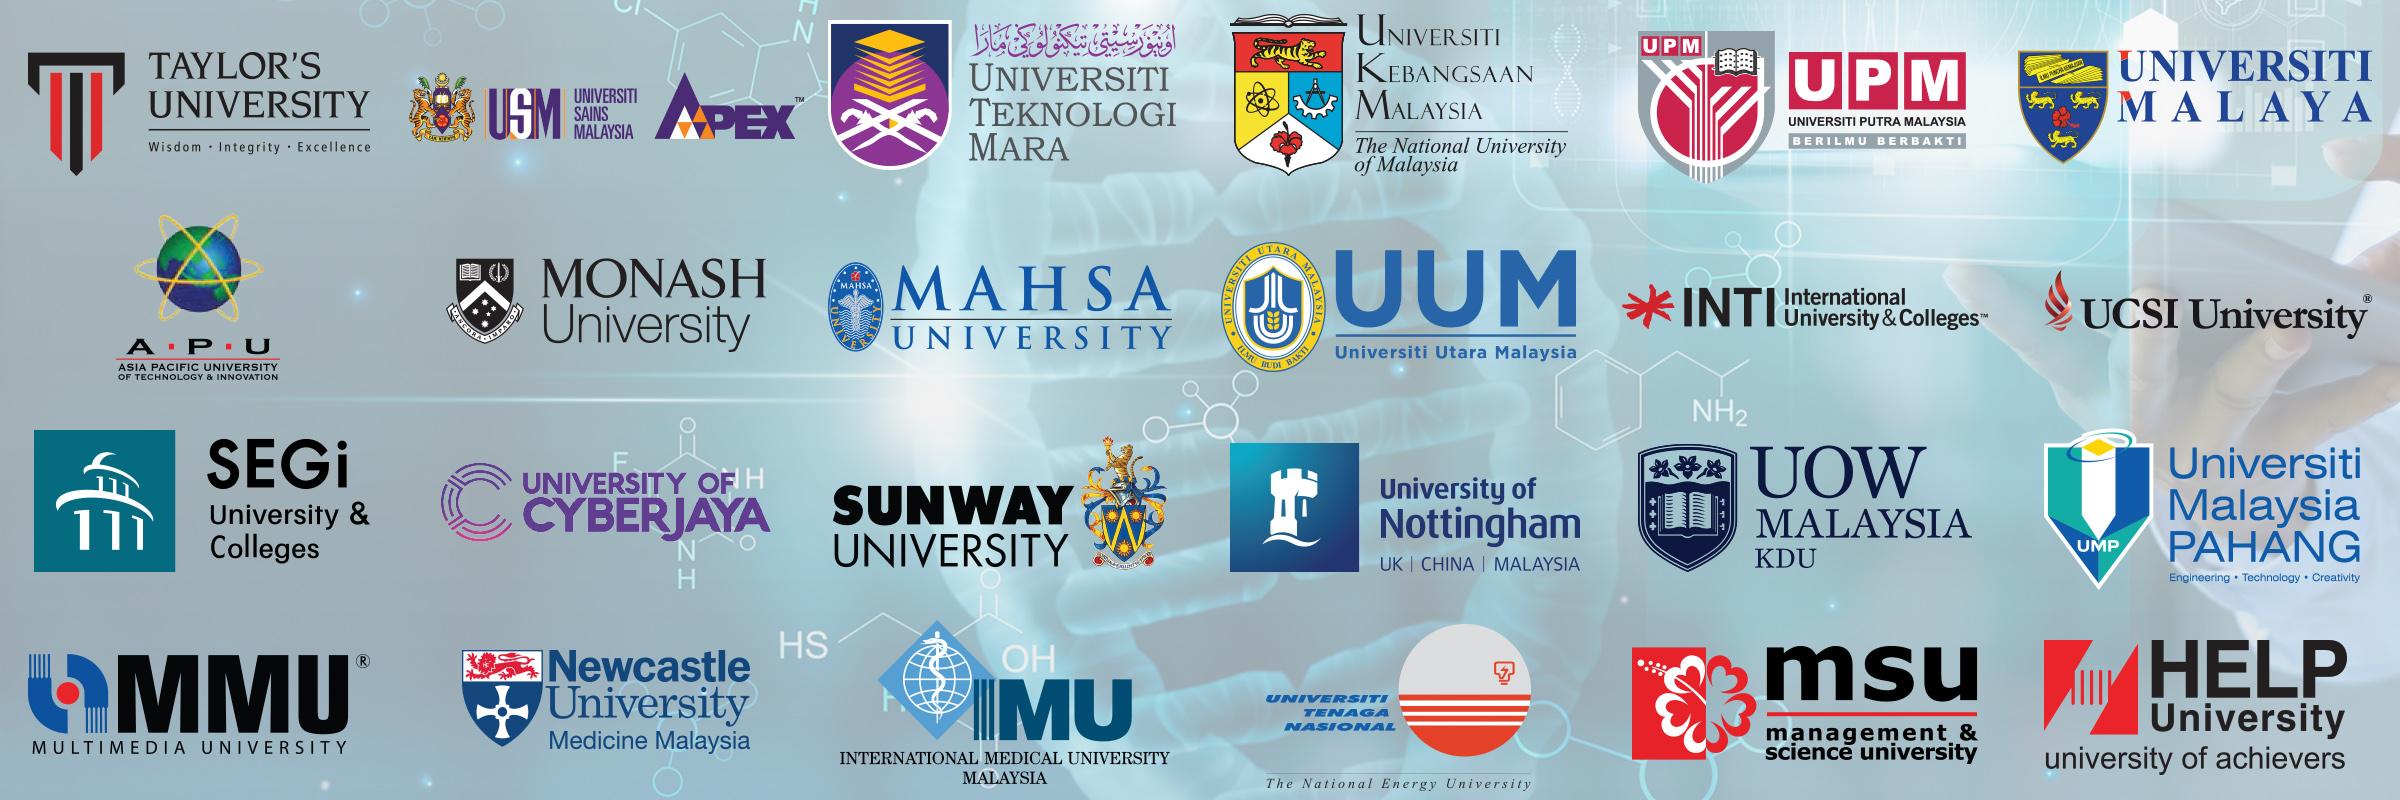 universities list